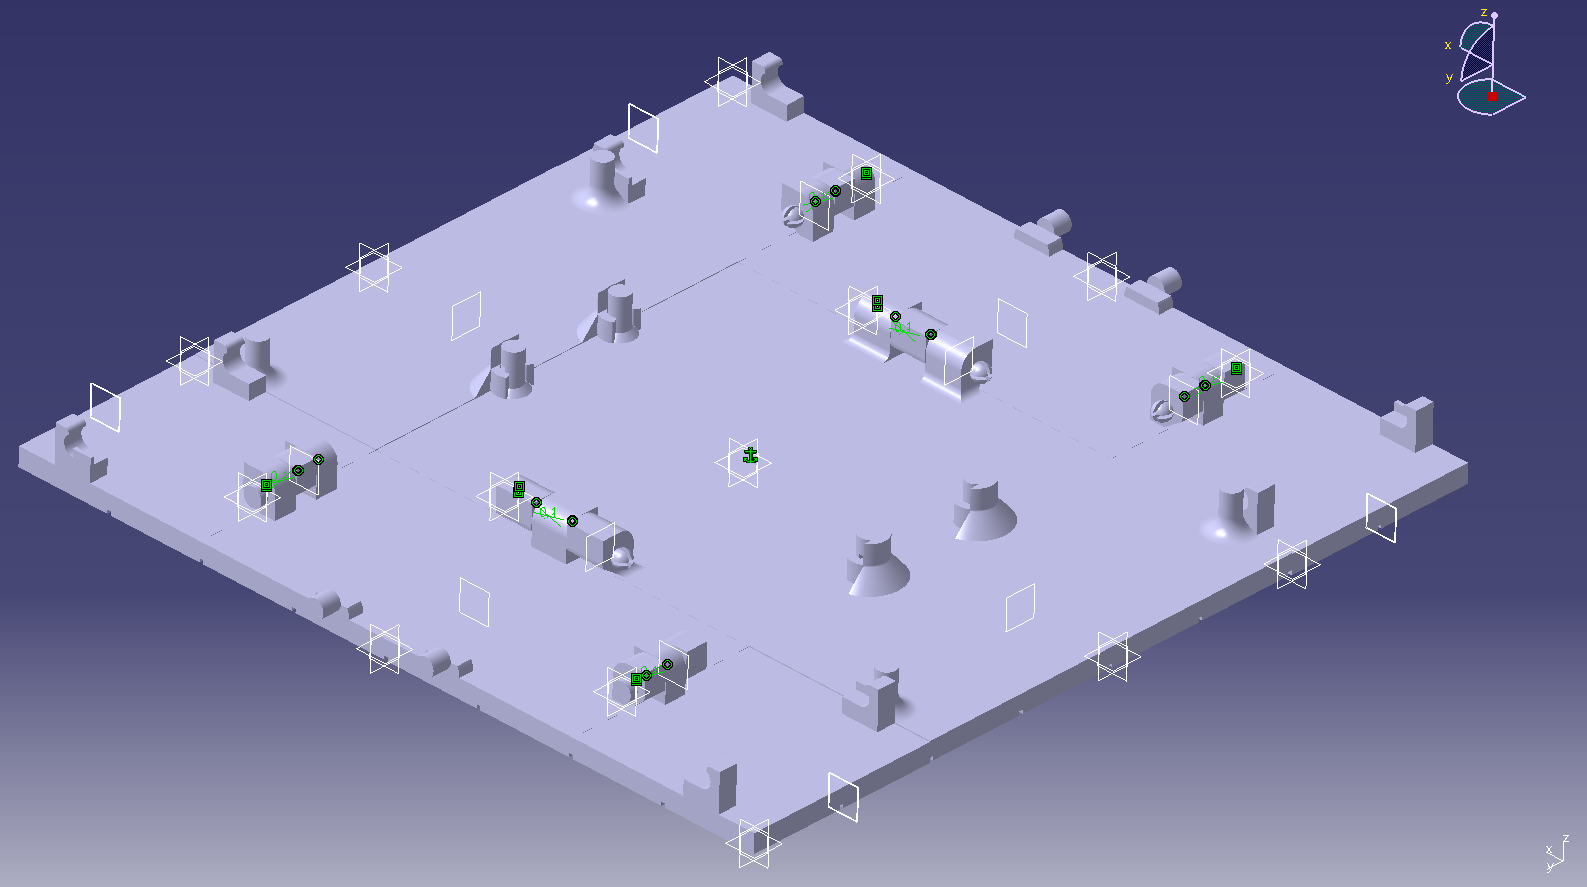 Tablero_abierto.png Download free STL file Tablero de ajedrez desplegable • 3D print object, alexanderegido